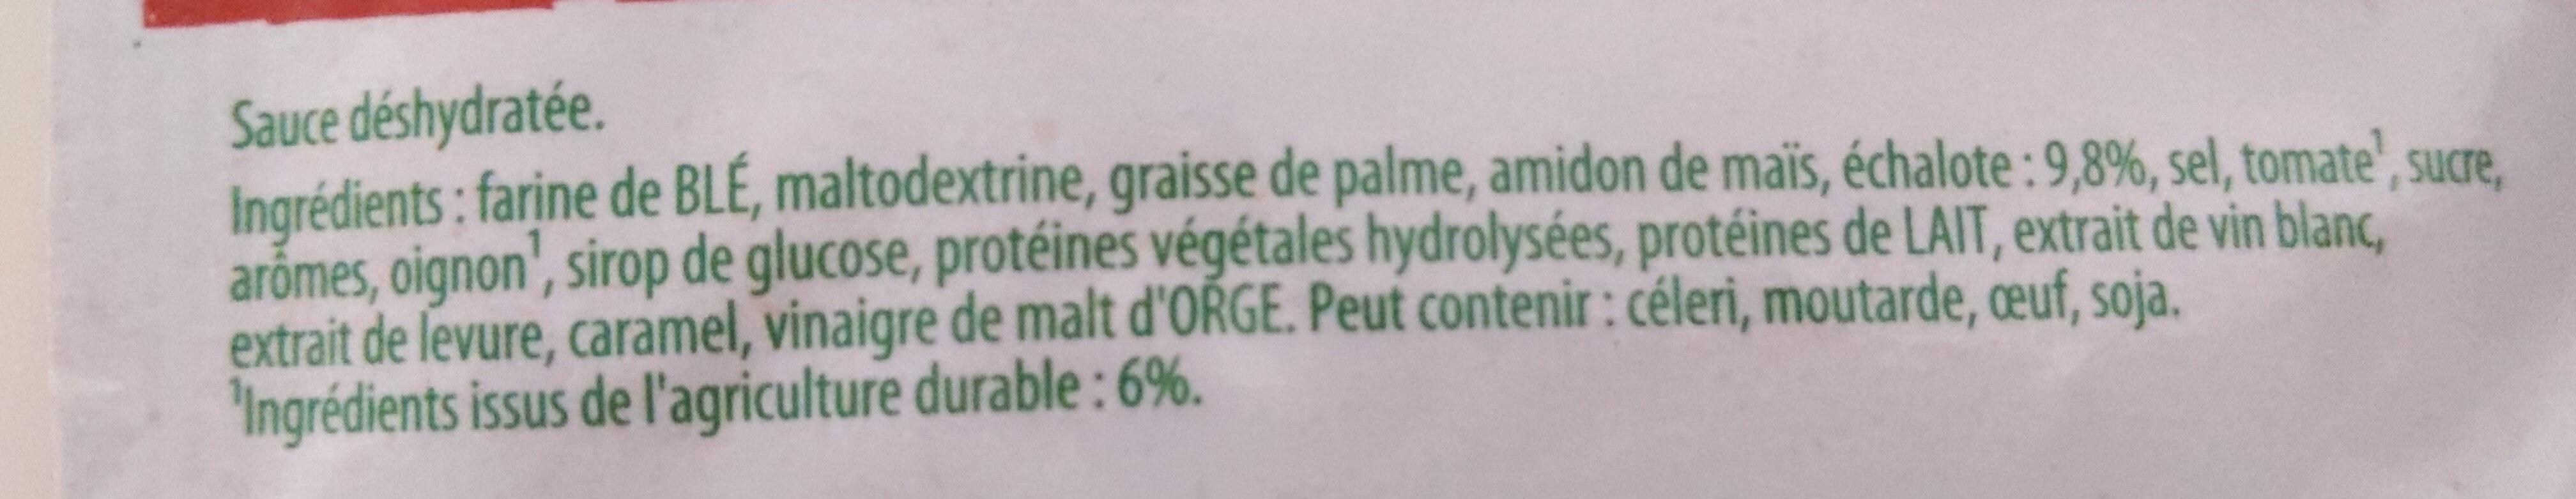 Knorr Sauce Déshydratée Echalote 33g - Ingredients - fr